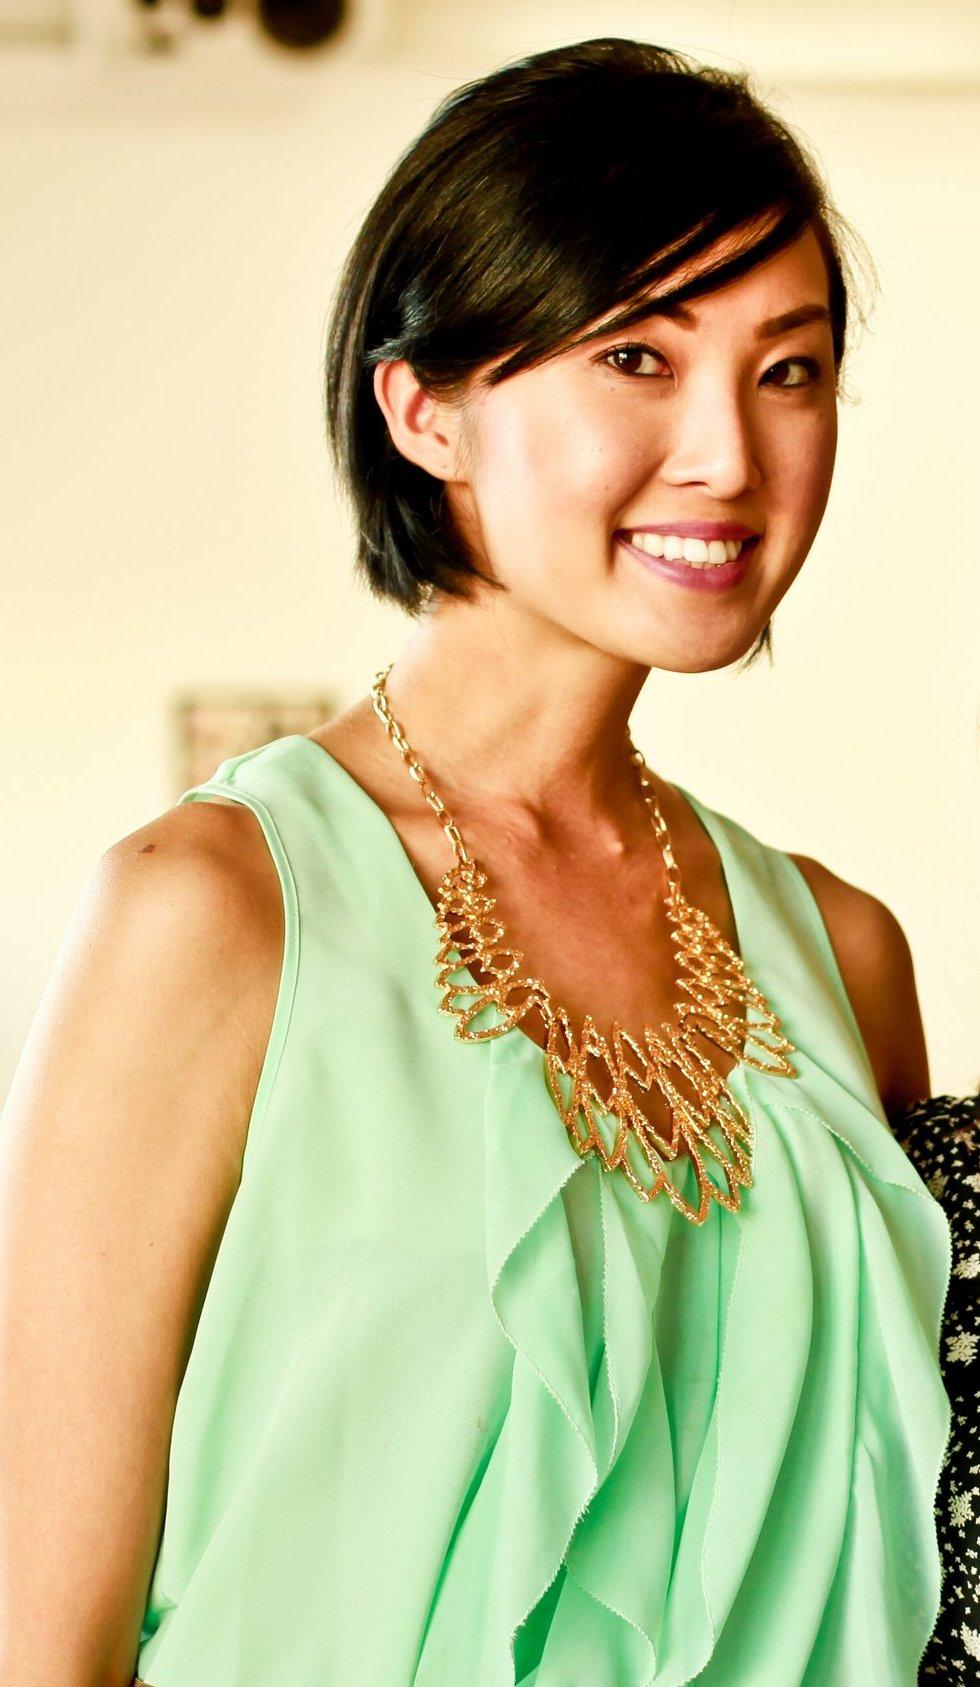 Chriselle Lim Wikipedia